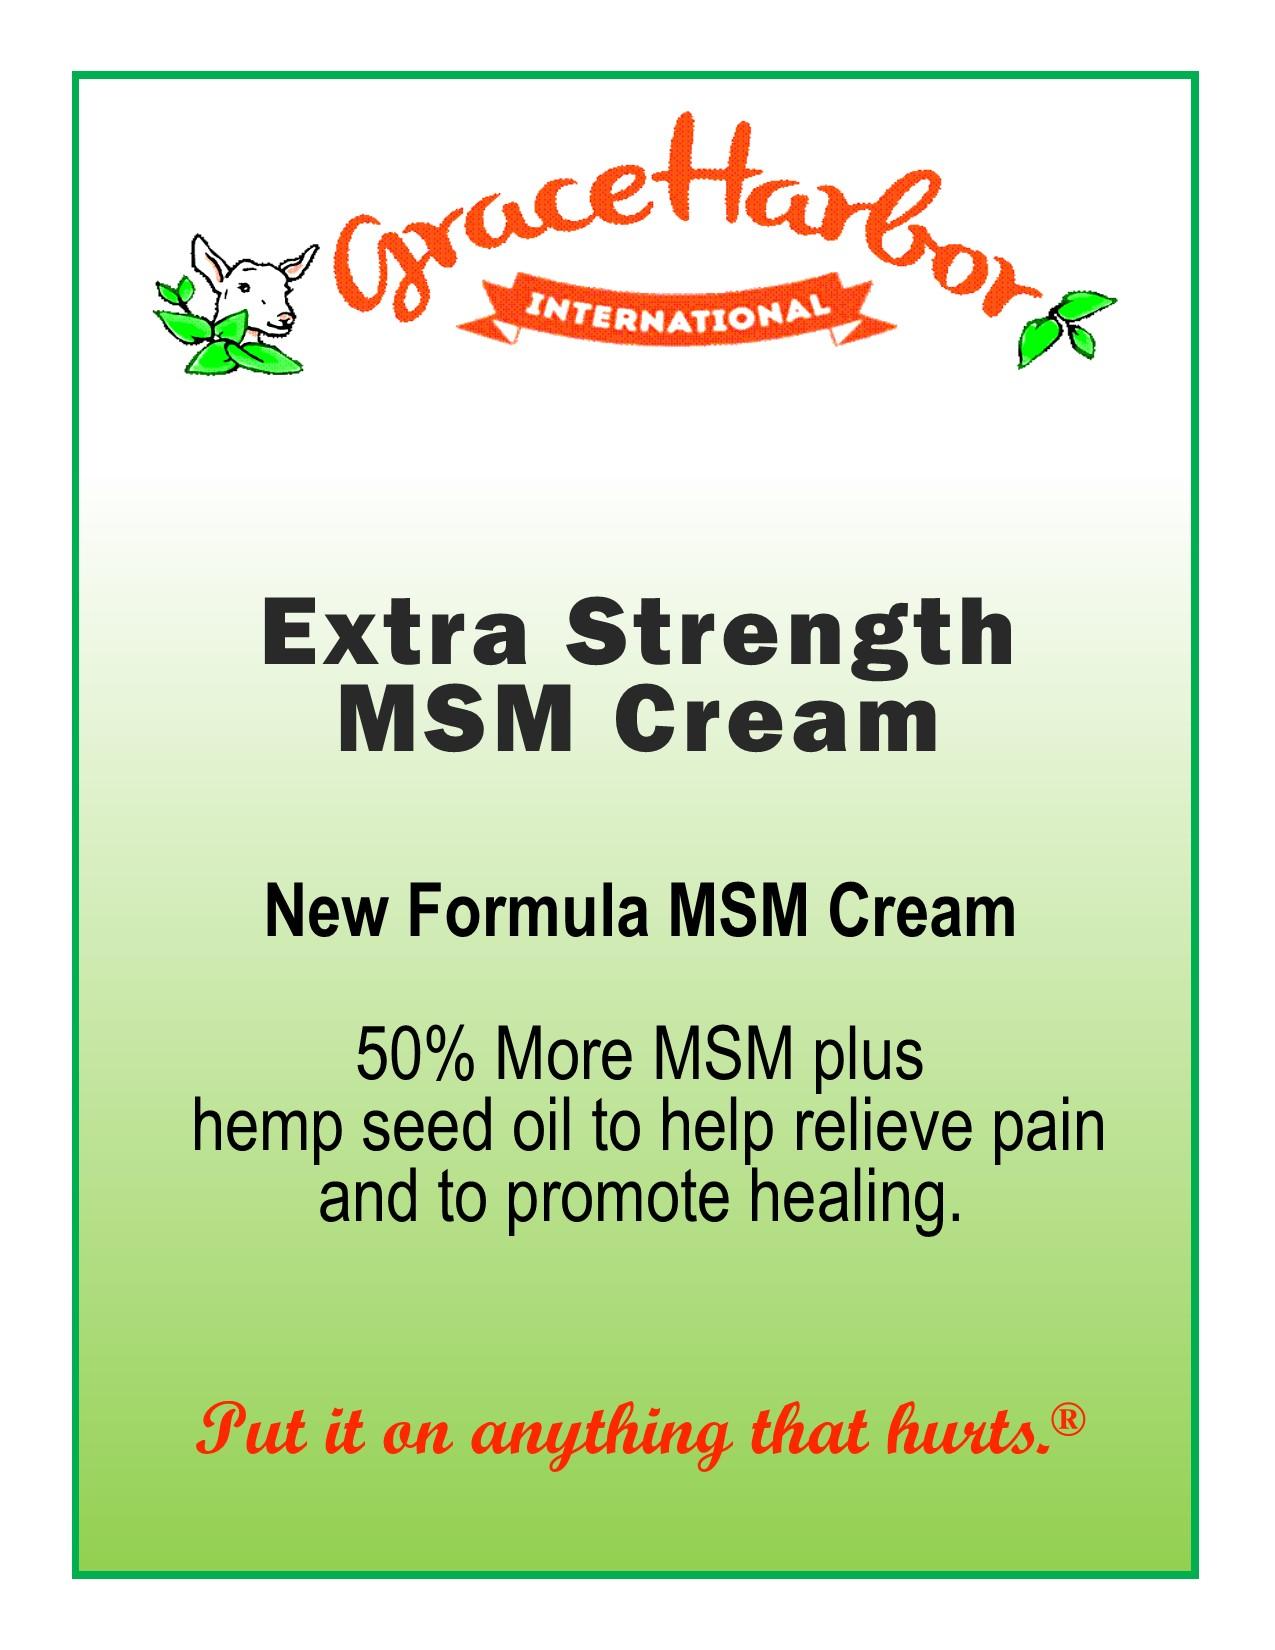 extra-strength-msm-poster.jpg